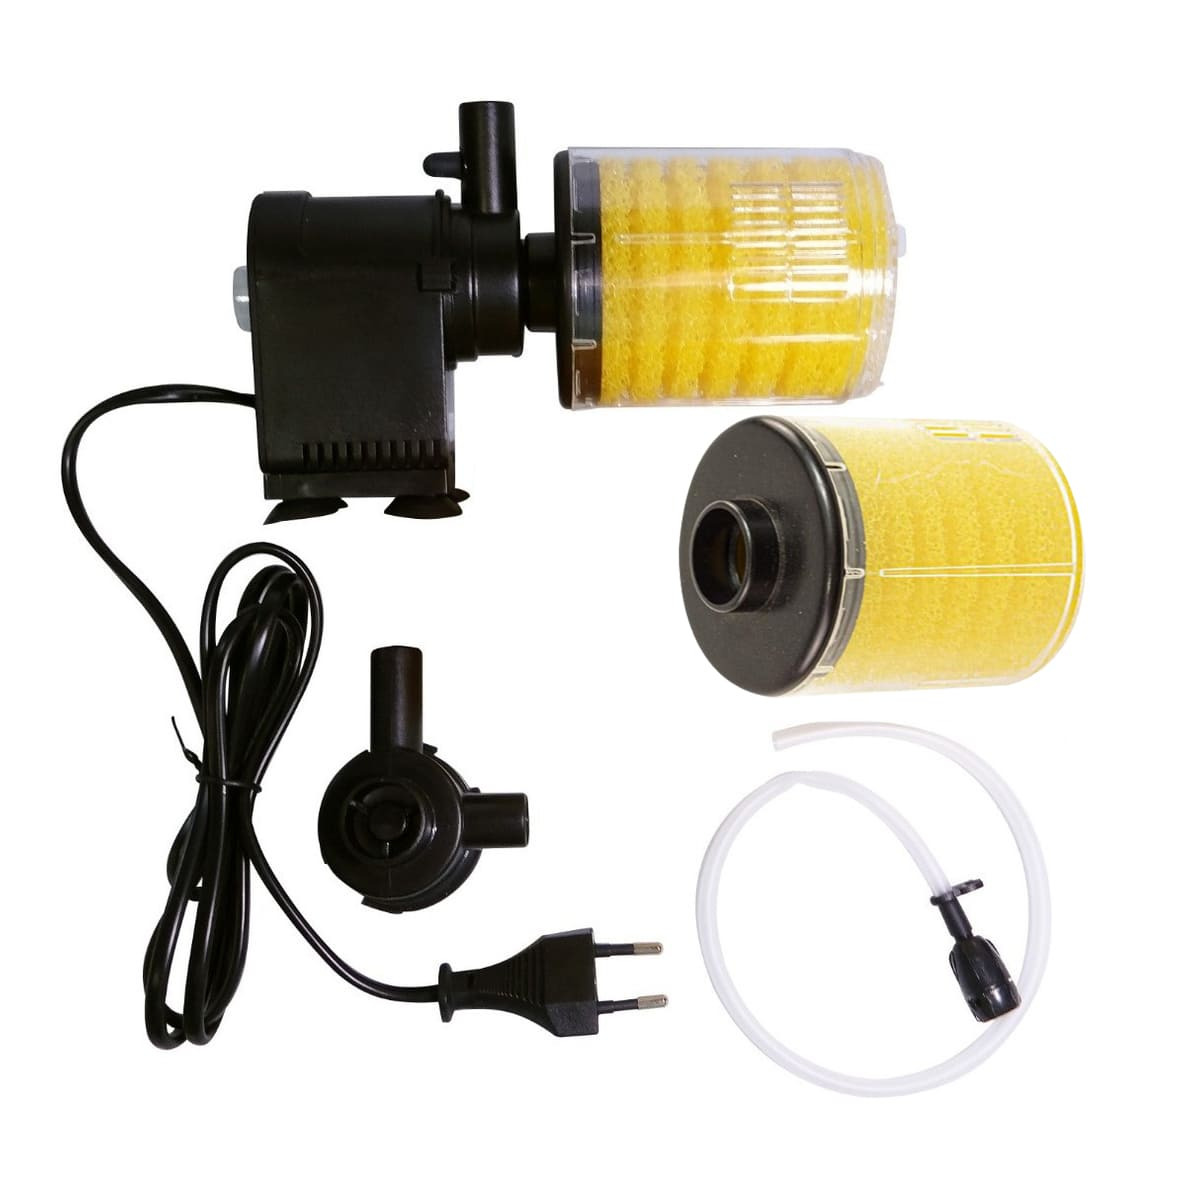 Filtro Interno para Aquários Jad SP-1000 II 8w 300 L/H